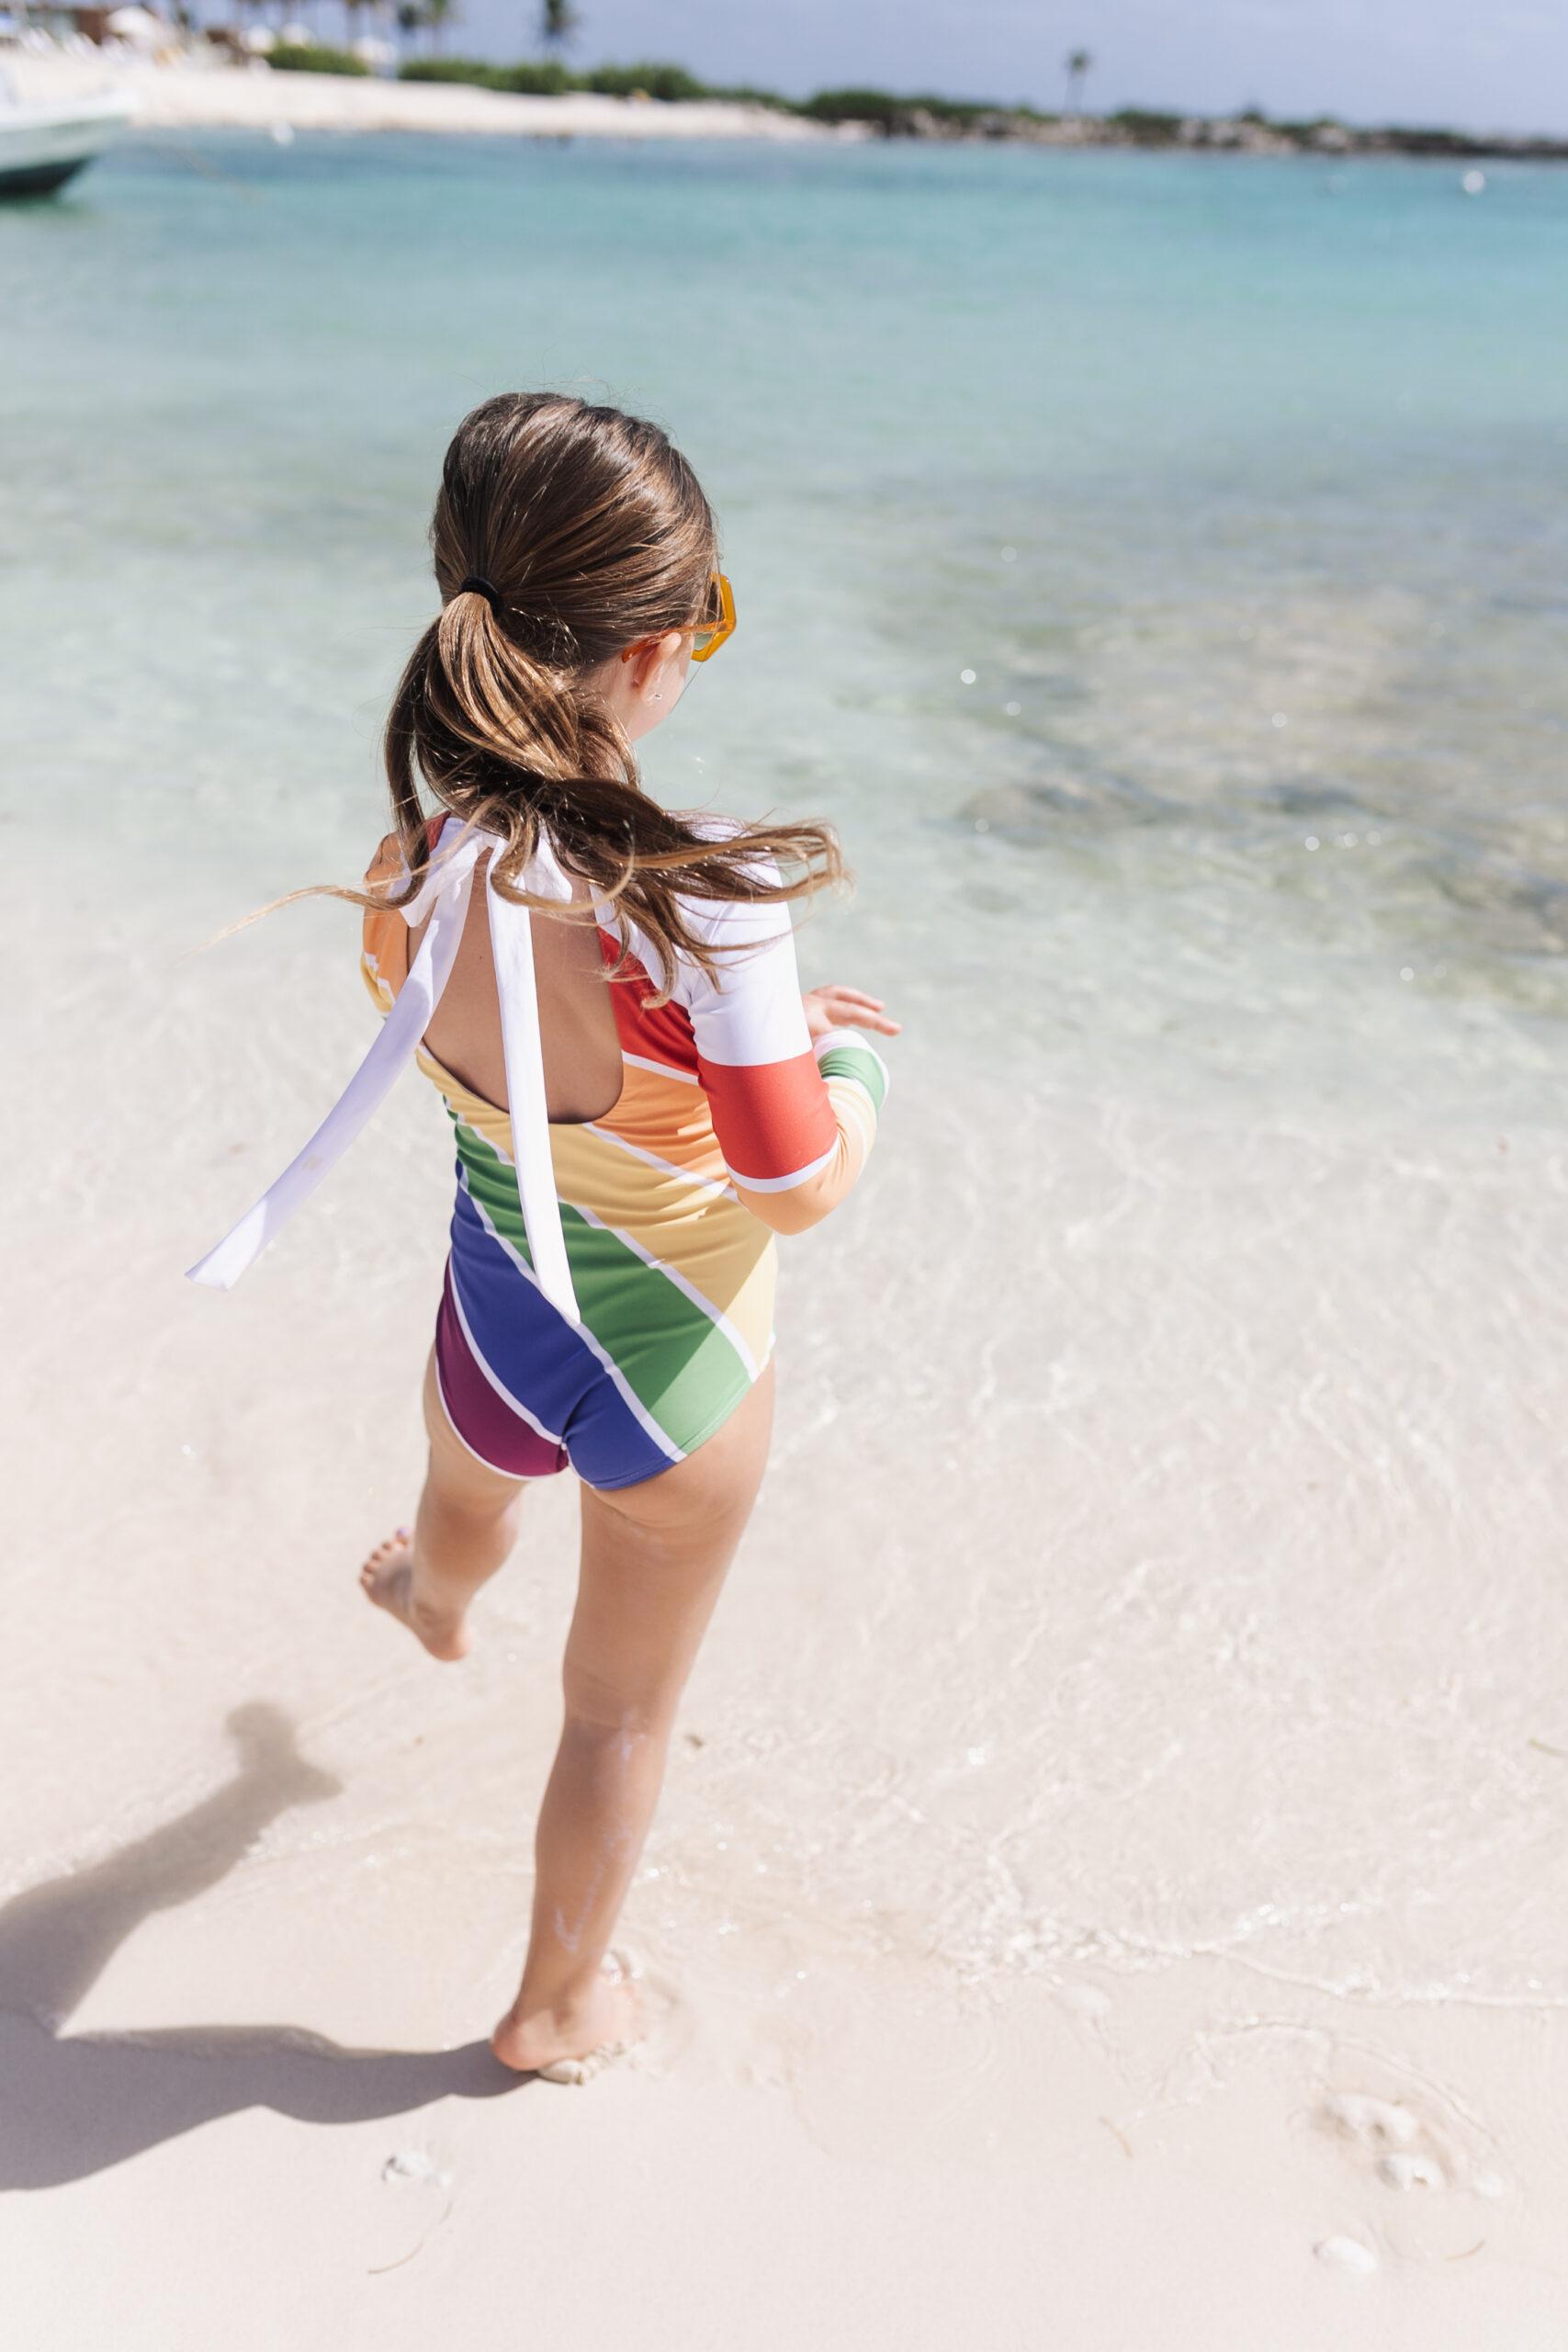 my rainbow girl by the sea #thelovedesignedlife #theldltravles #visitmexico #beachbabe